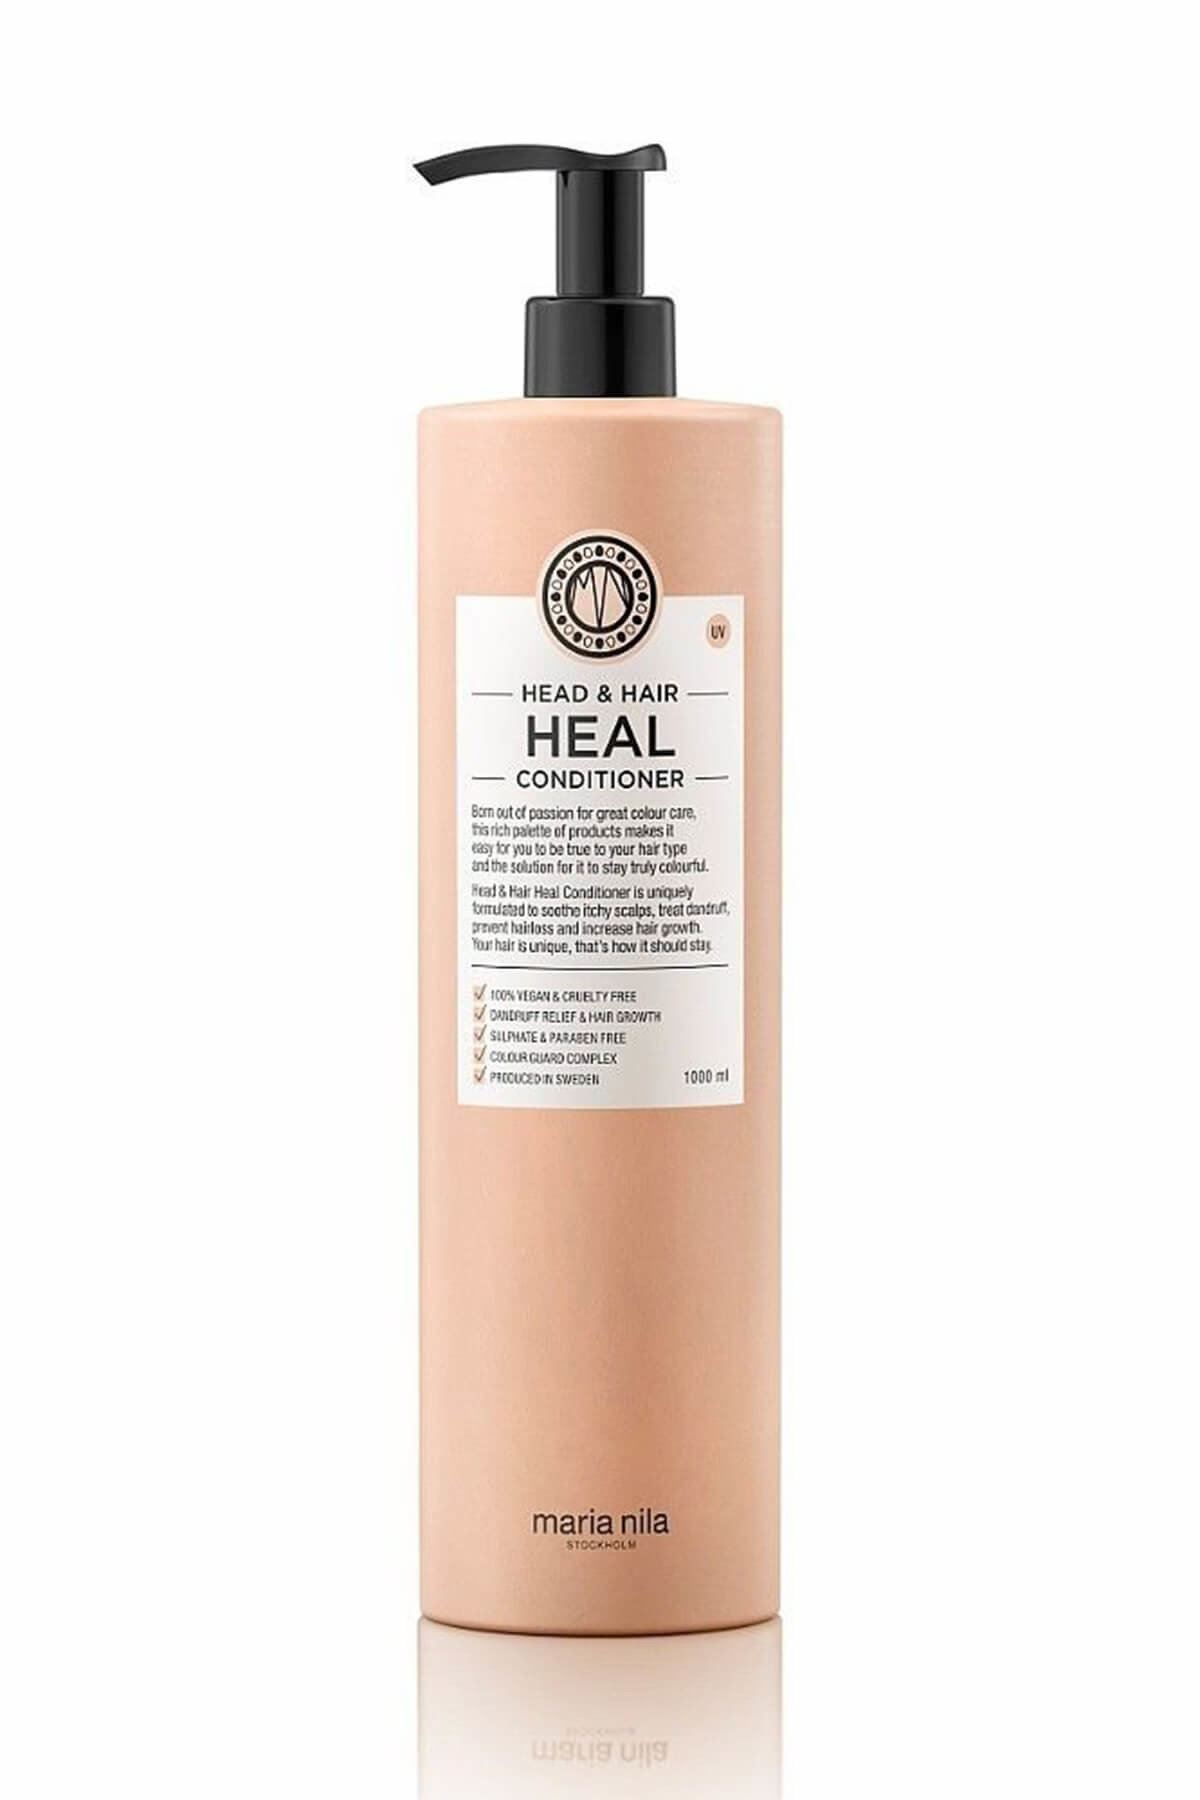 Head & Hair Heal Boyalı Saç Bakım Kremi 1000 ml